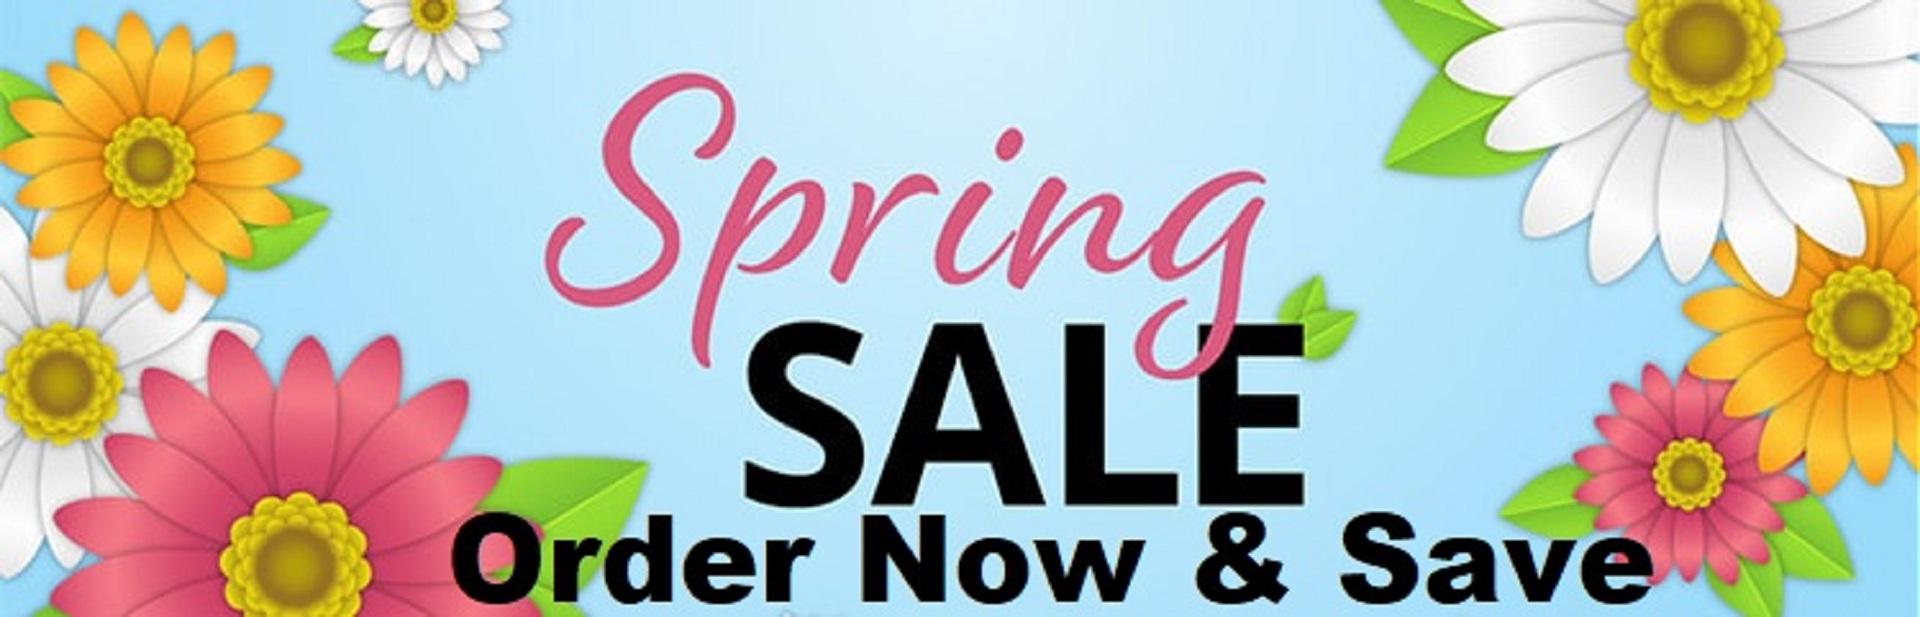 Spring Swing Sale